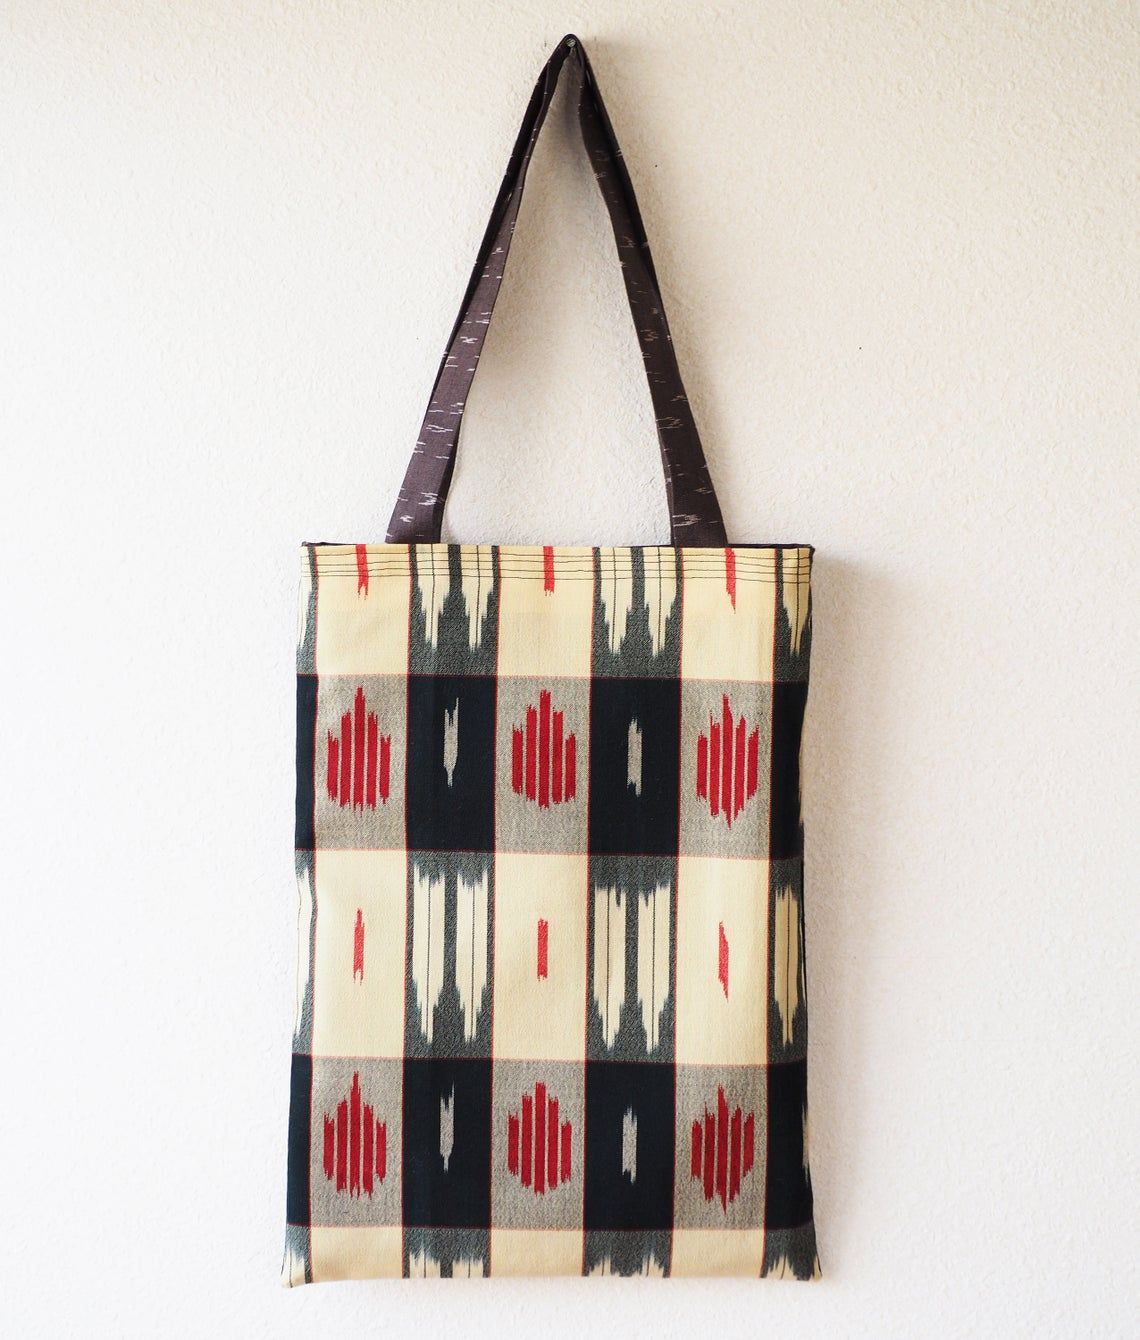 Japanese Vintage Kimono Fabric Kimono Remake Tote Bag In 2020 Vintage Kimono Fabric Vintage Kimono Handmade